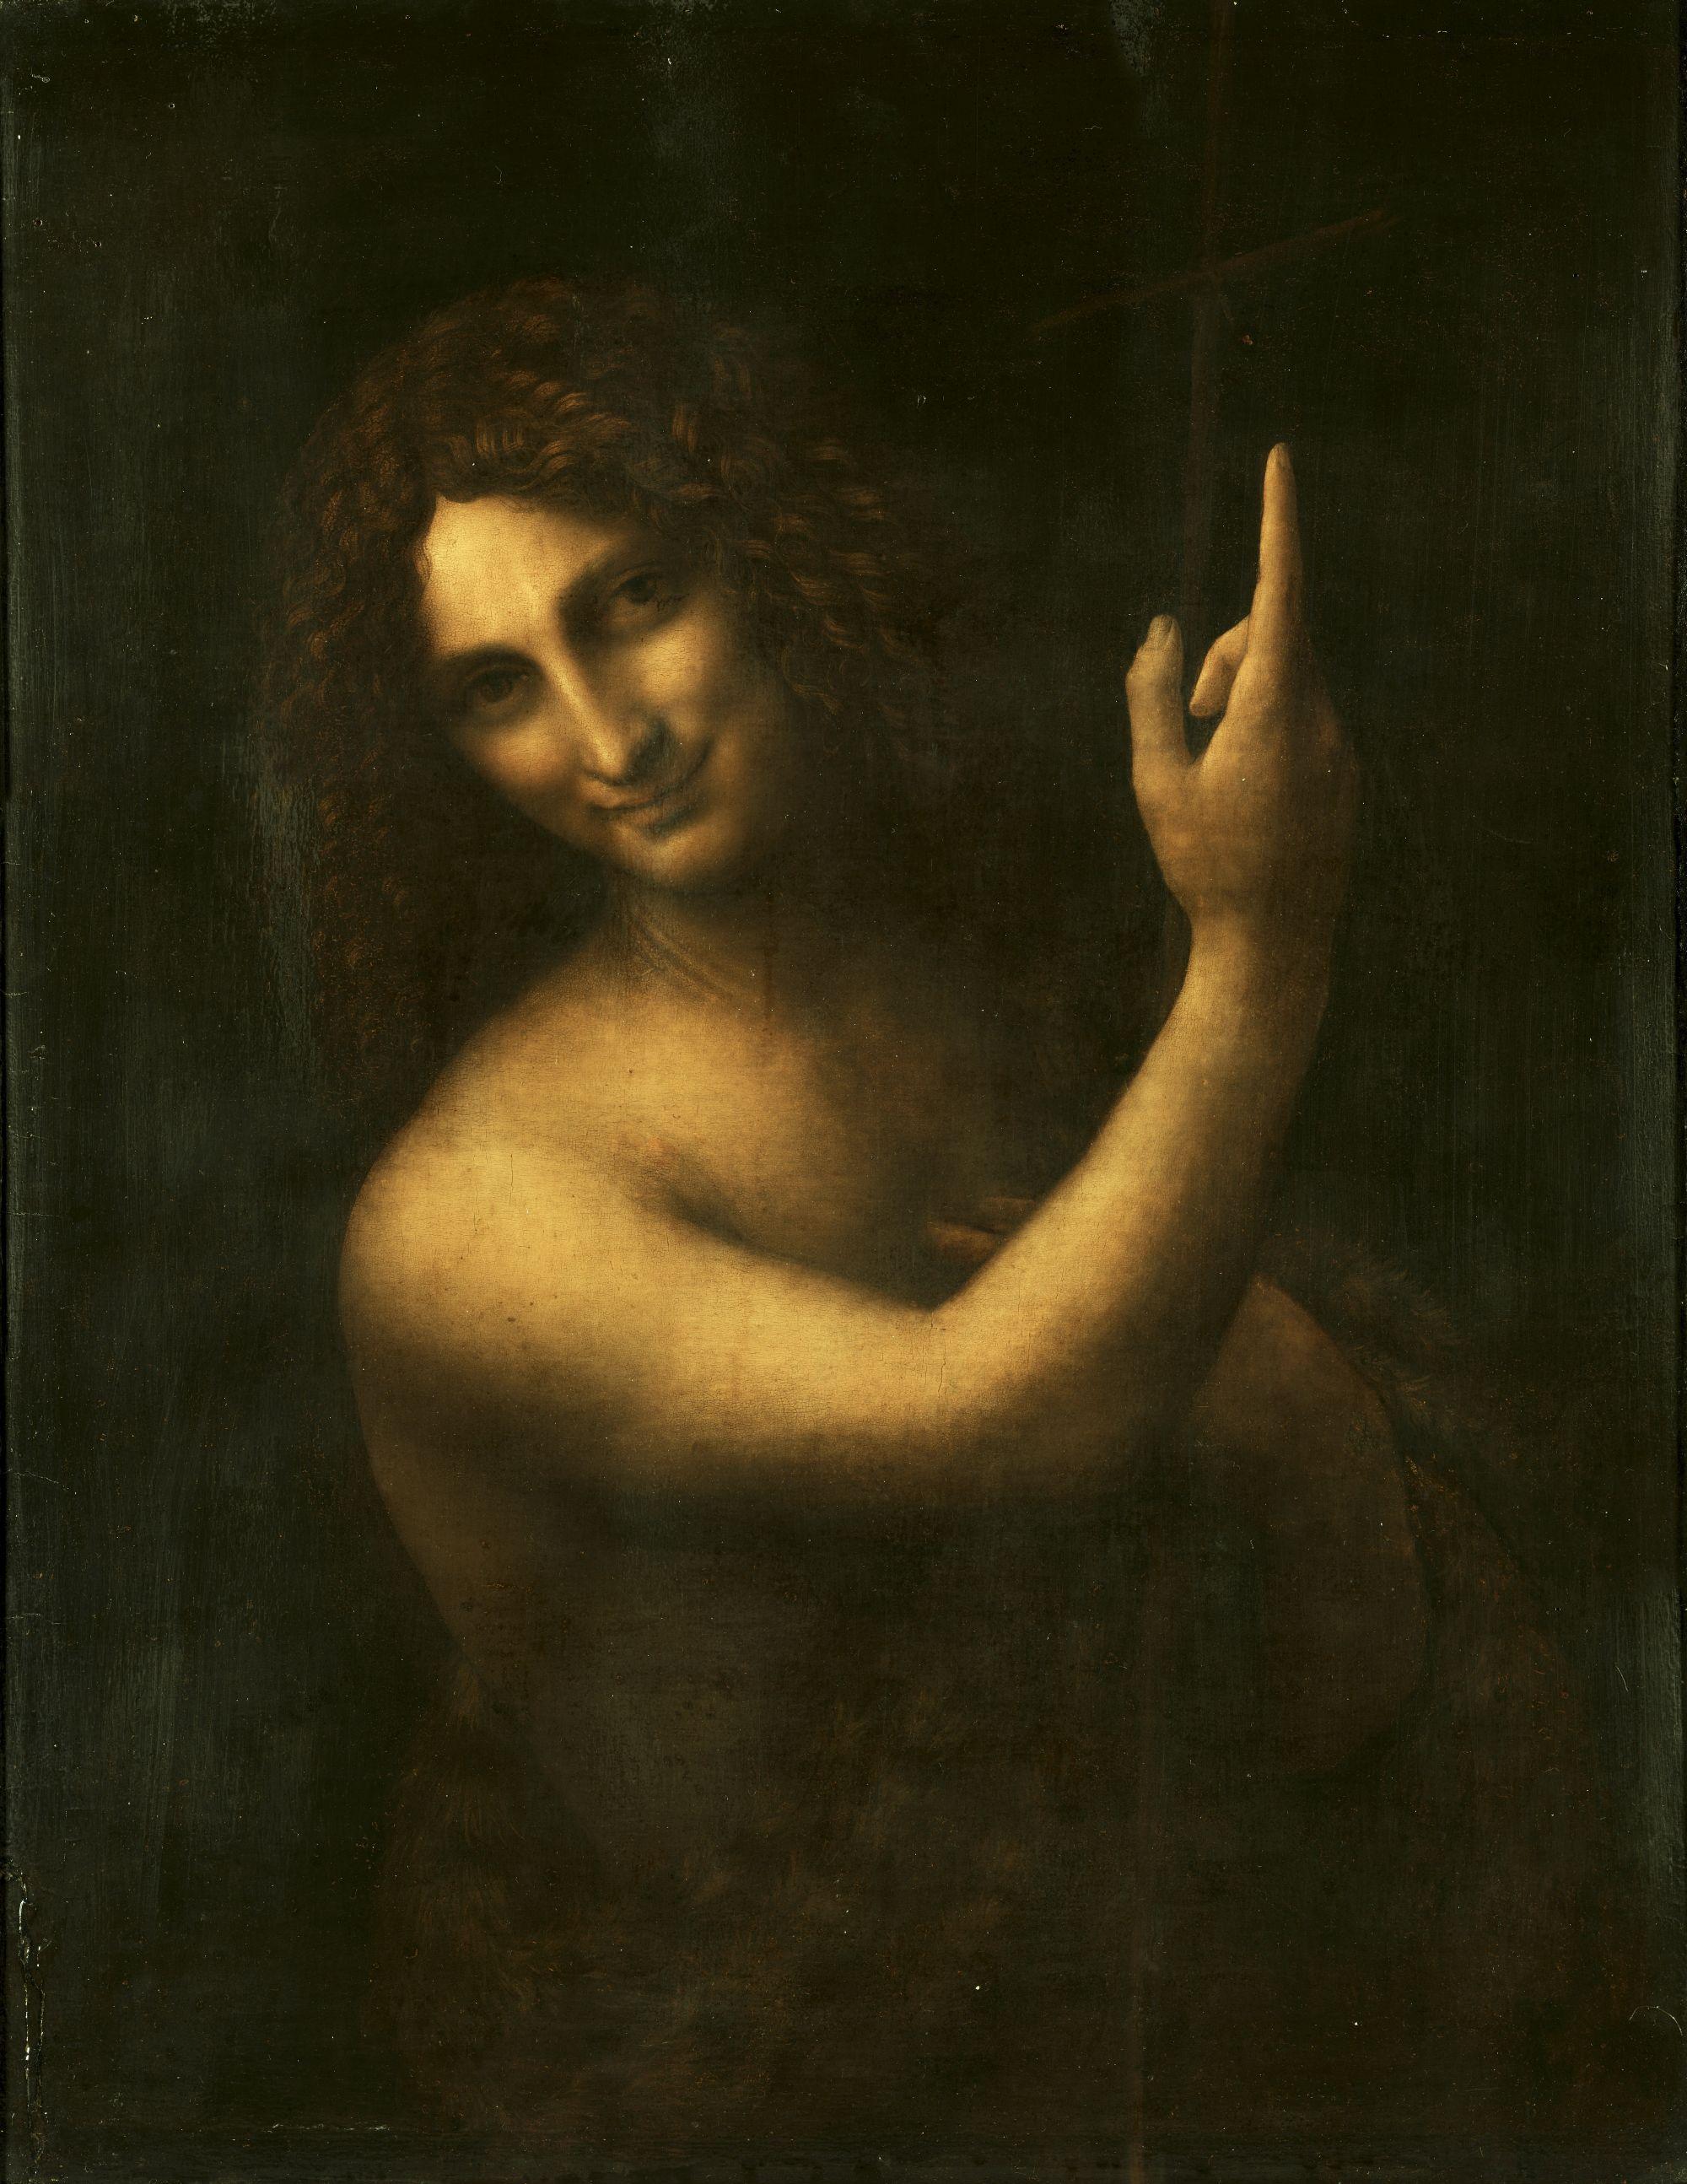 Леонардо да Винчи. Иоанн Креститель. 1514-1516. Масло, дерево. 69х57 см. Лувр, Париж.